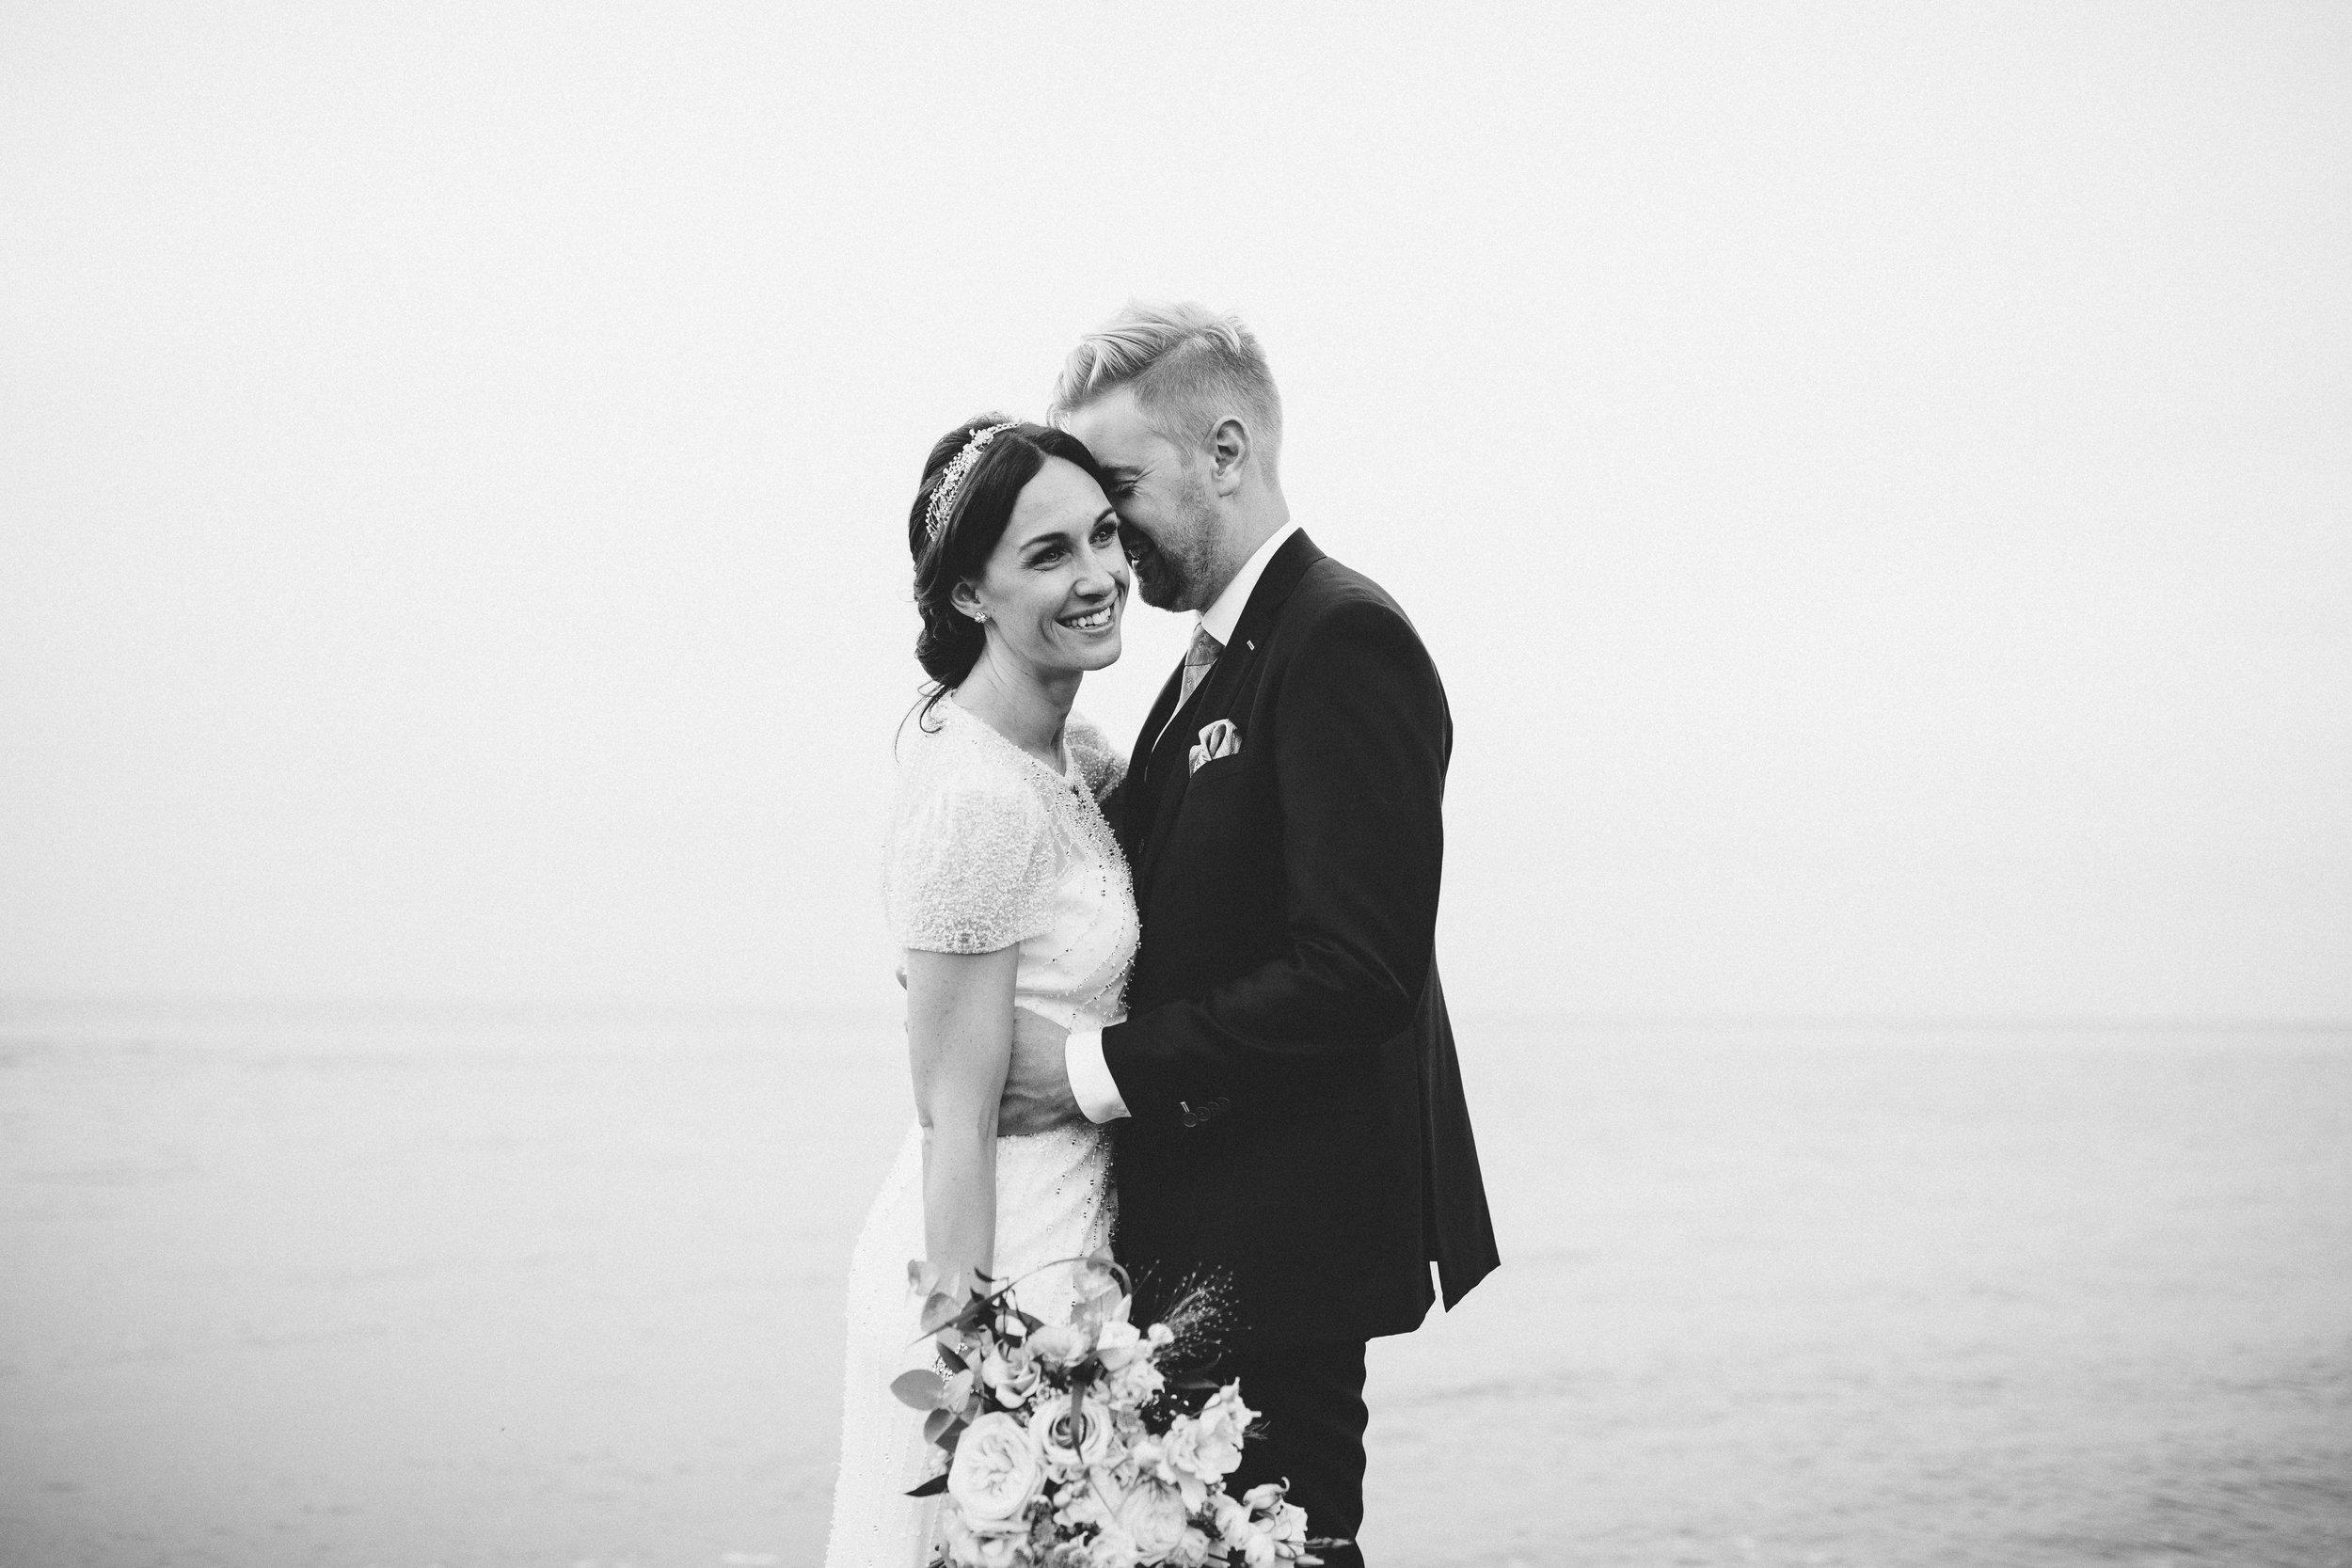 Charlotte & Mark - East Quay Wedding Venue | Whitstable